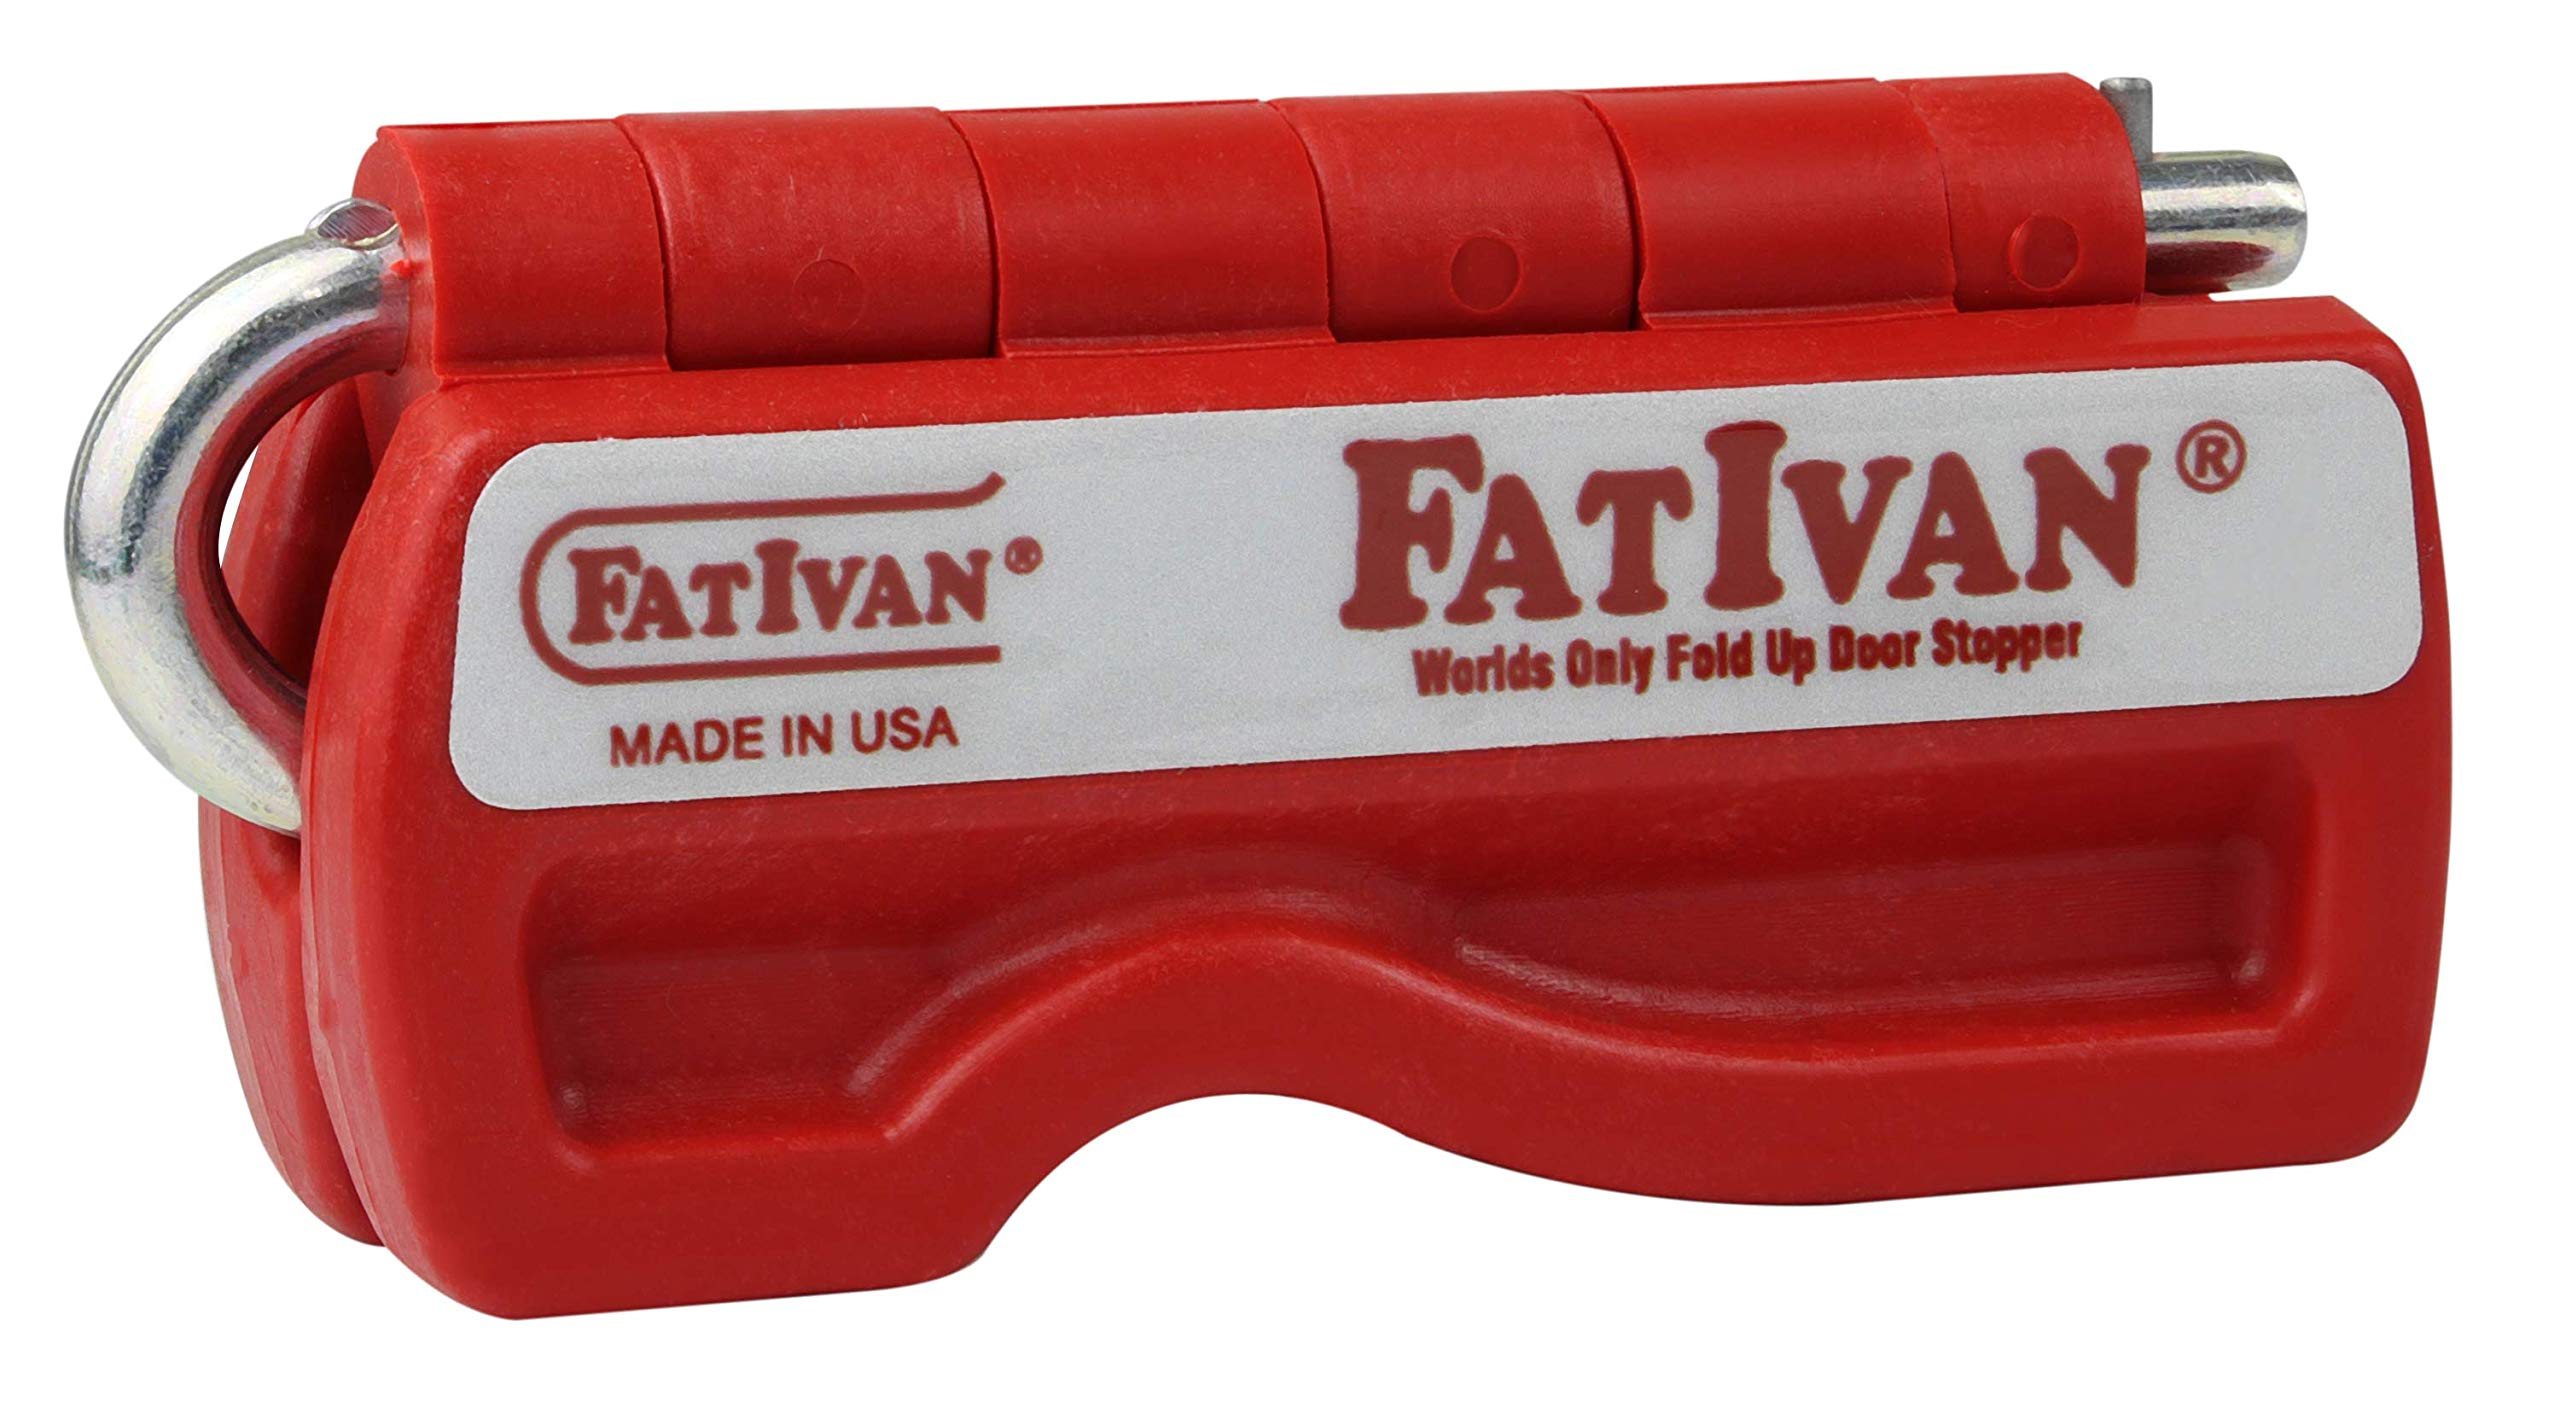 The Original Fat Ivan Fold Up Door Chock with Magnet - Red